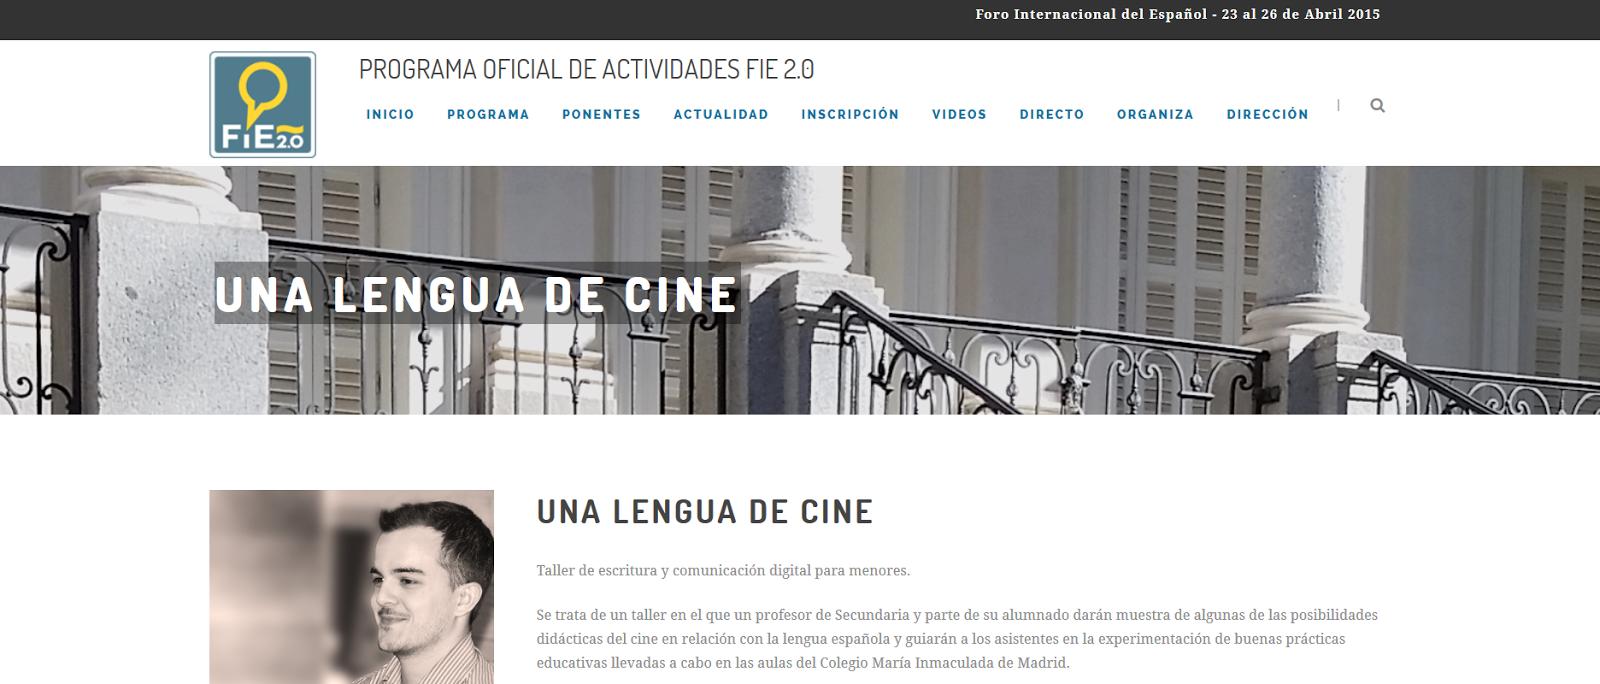 http://www.españolalternativaglobal.com/session/una-lengua-de-cine/